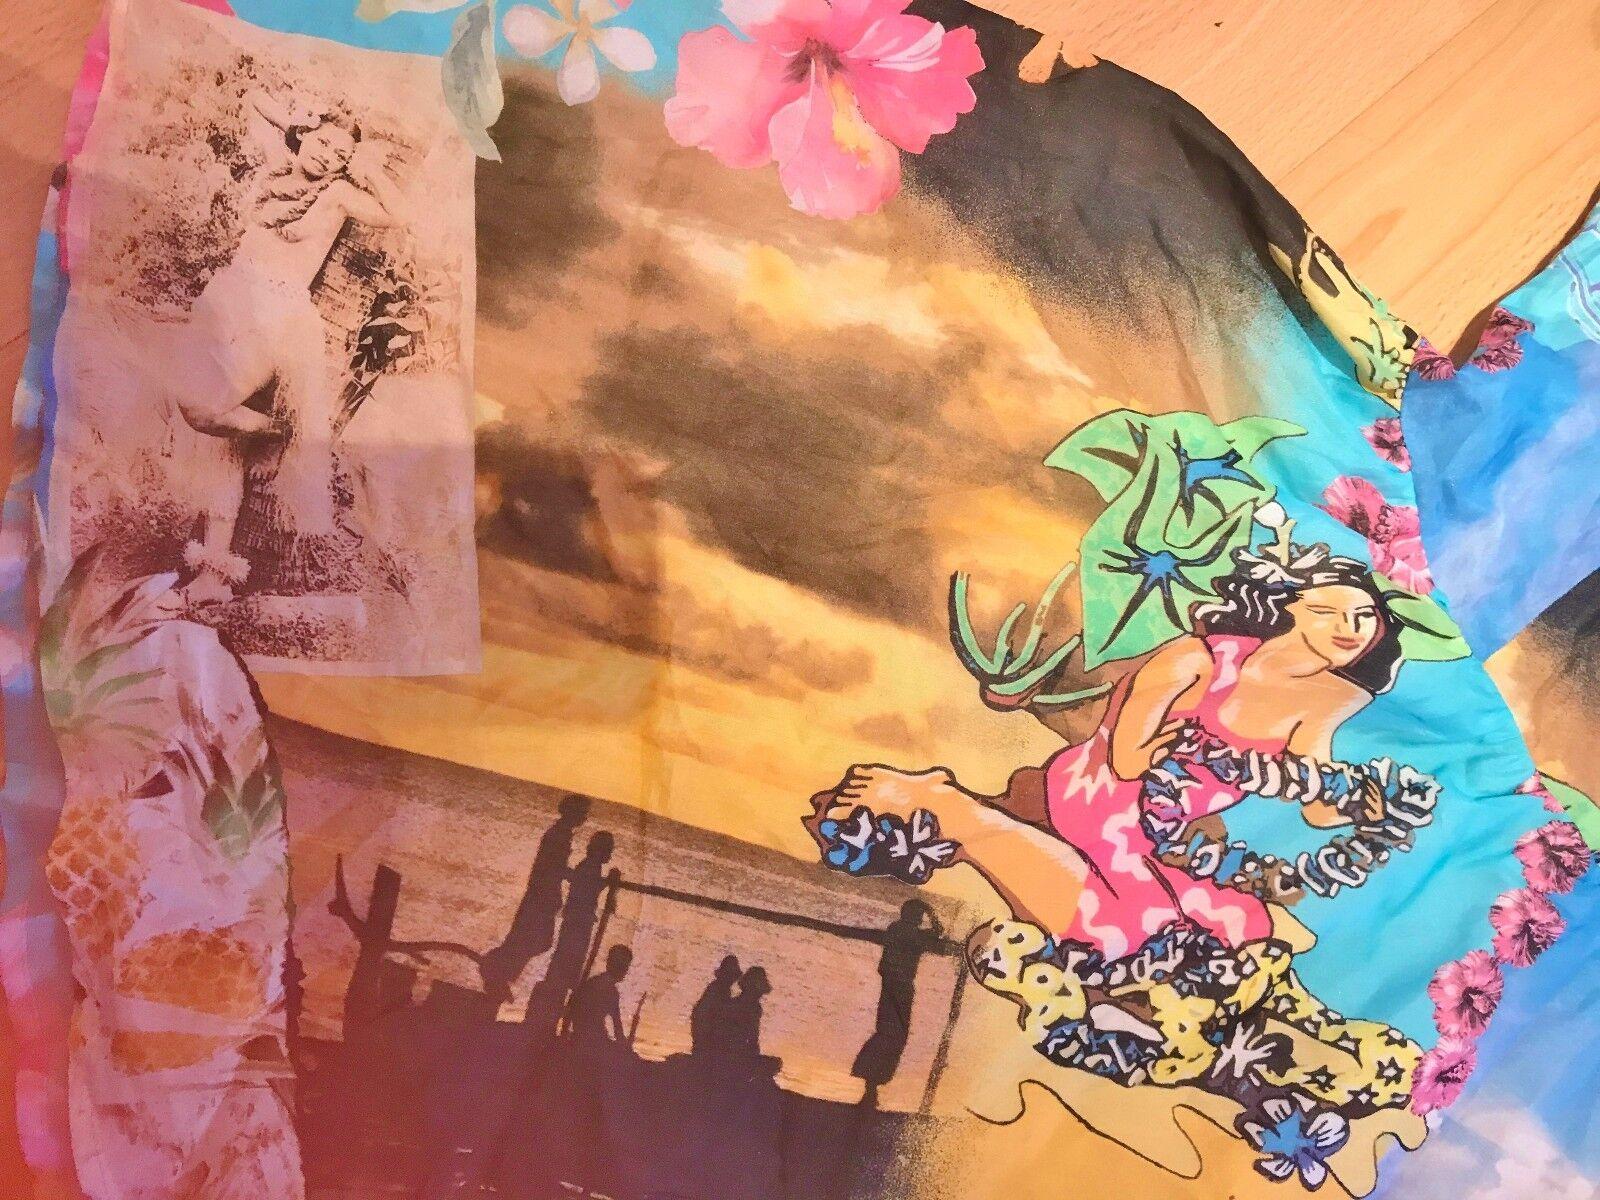 Silk summer mini dress with Hawaiian Girl, Hula Dancer Dancer Dancer design for Hula dance 7b13e8